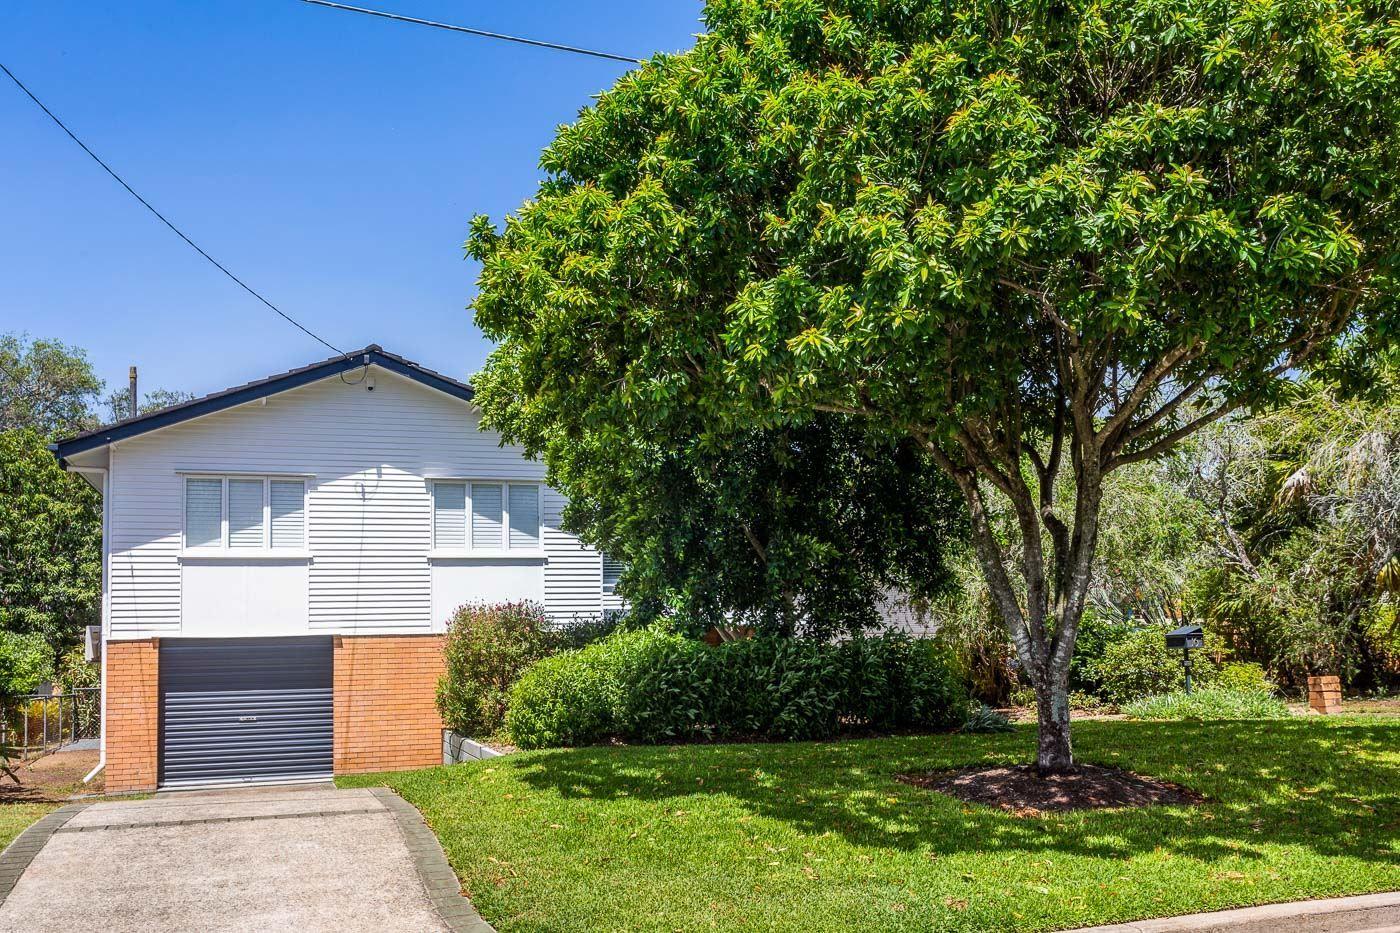 16 Idriess Street, Oxley QLD 4075, Image 1